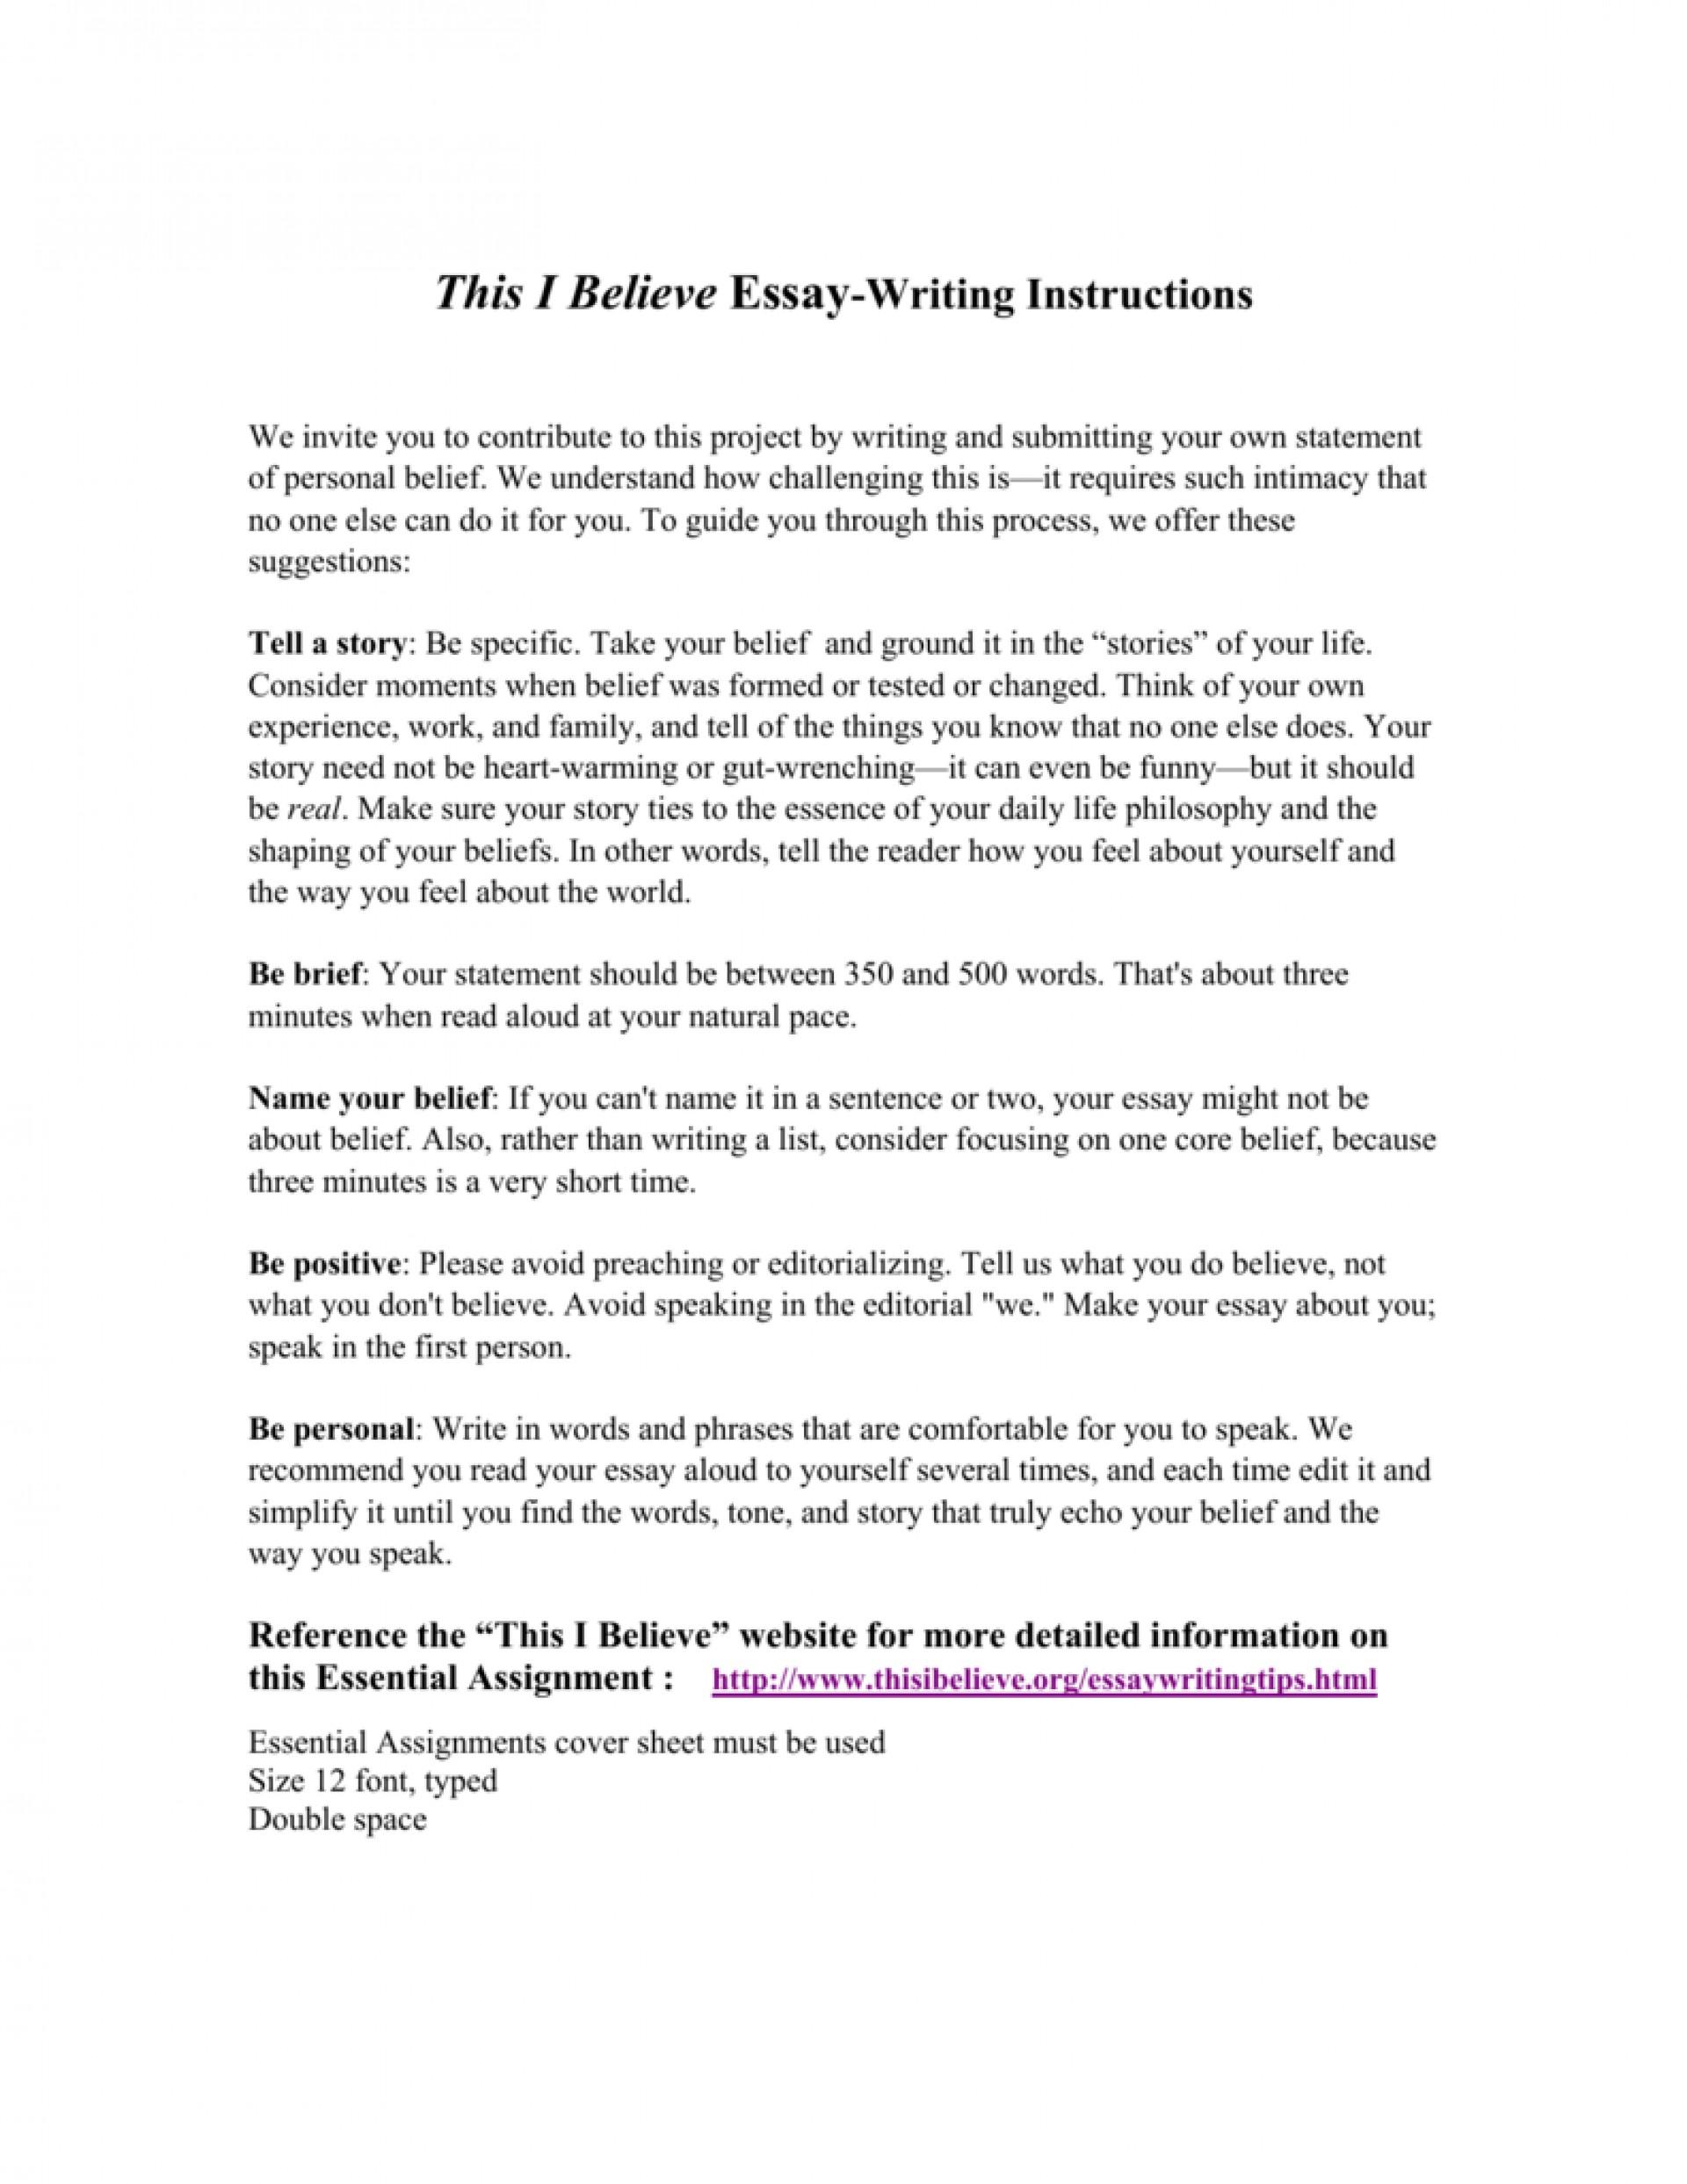 003 Essay Example Thisibelieve Org Essays Featured 008807219 1 Amazing Thisibelieve.org 1920